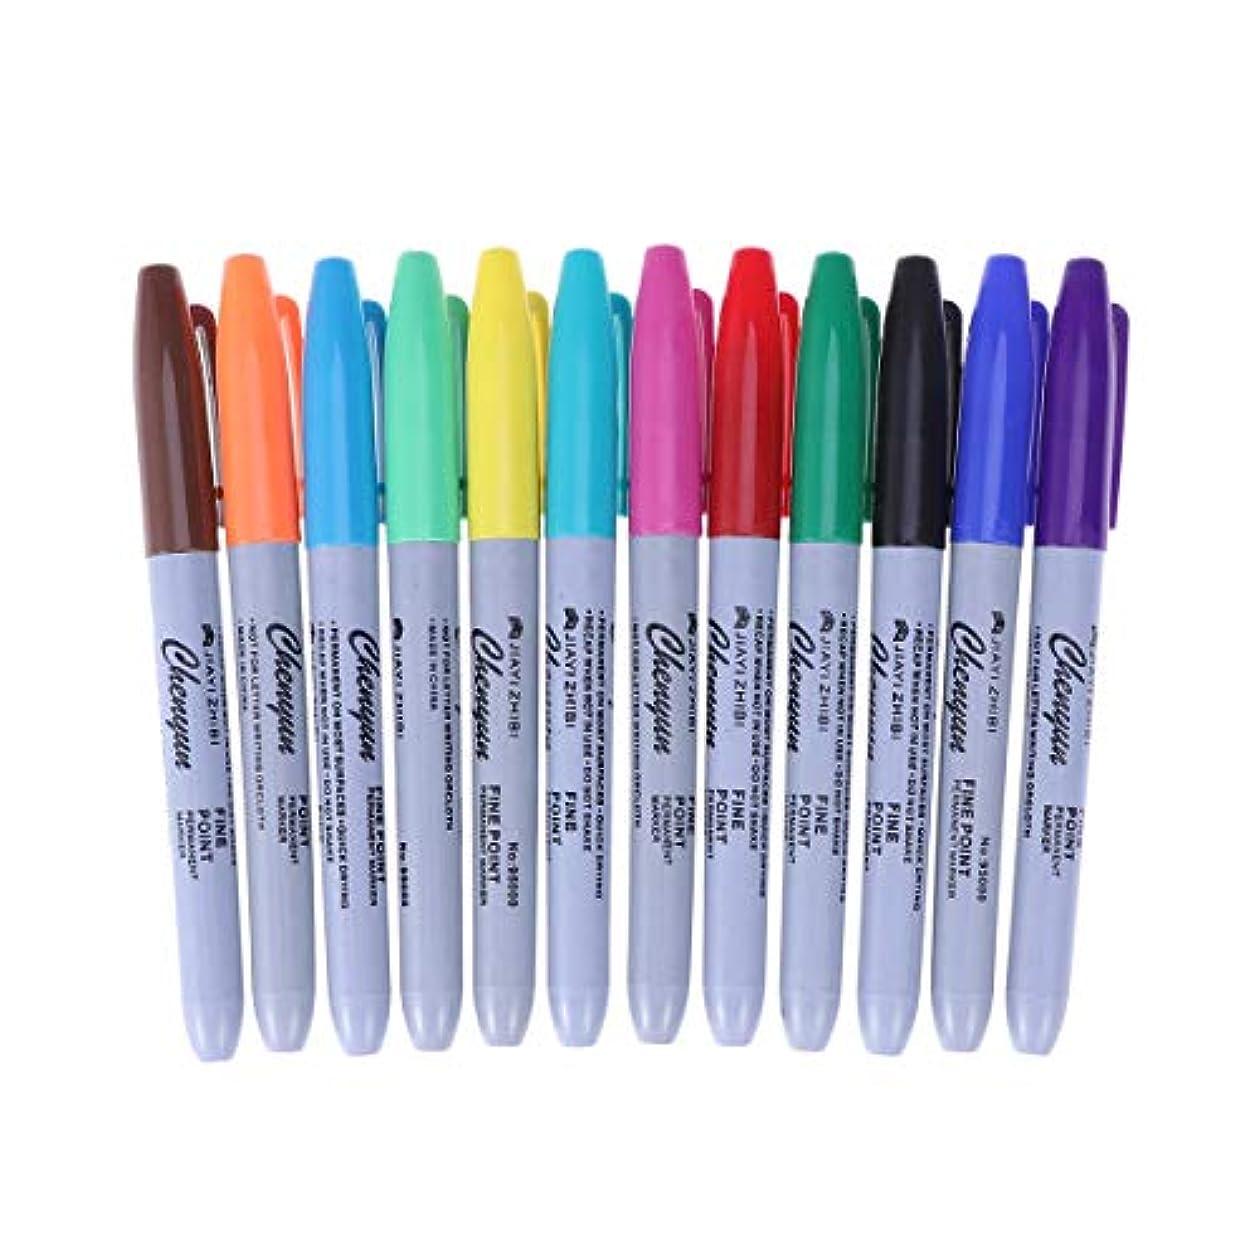 Healifty 12色タトゥーペン防水タトゥースキンマーカーマーキングスクライブペンファインとレッグチップタトゥー用品